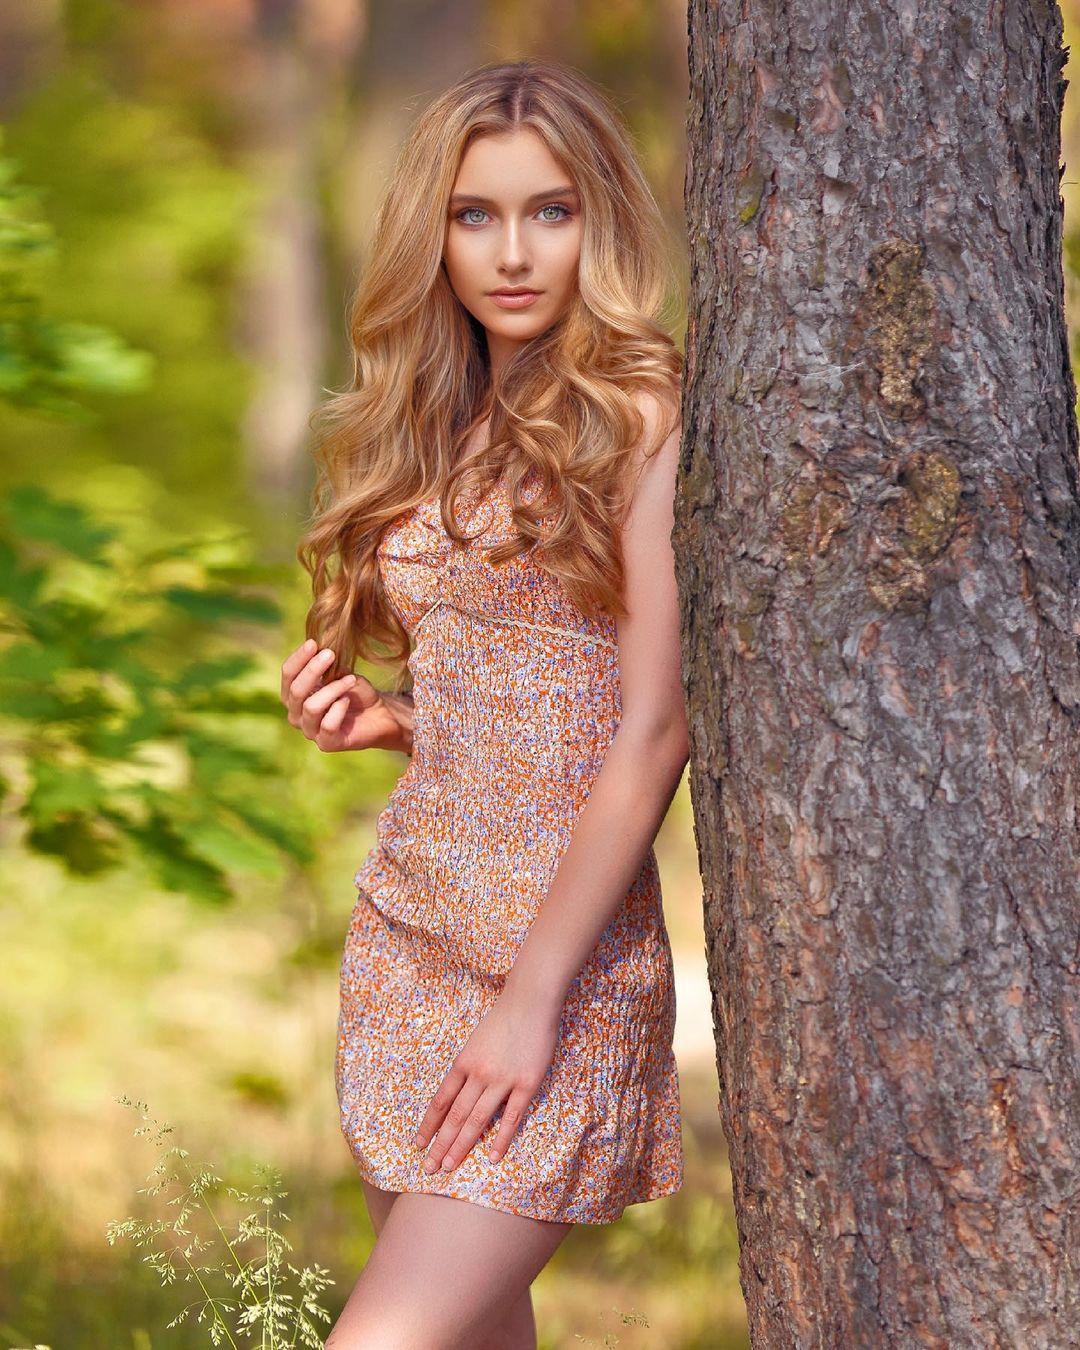 Alexandra-Lenarchyk-Wallpapers-Insta-Fit-Bio-2